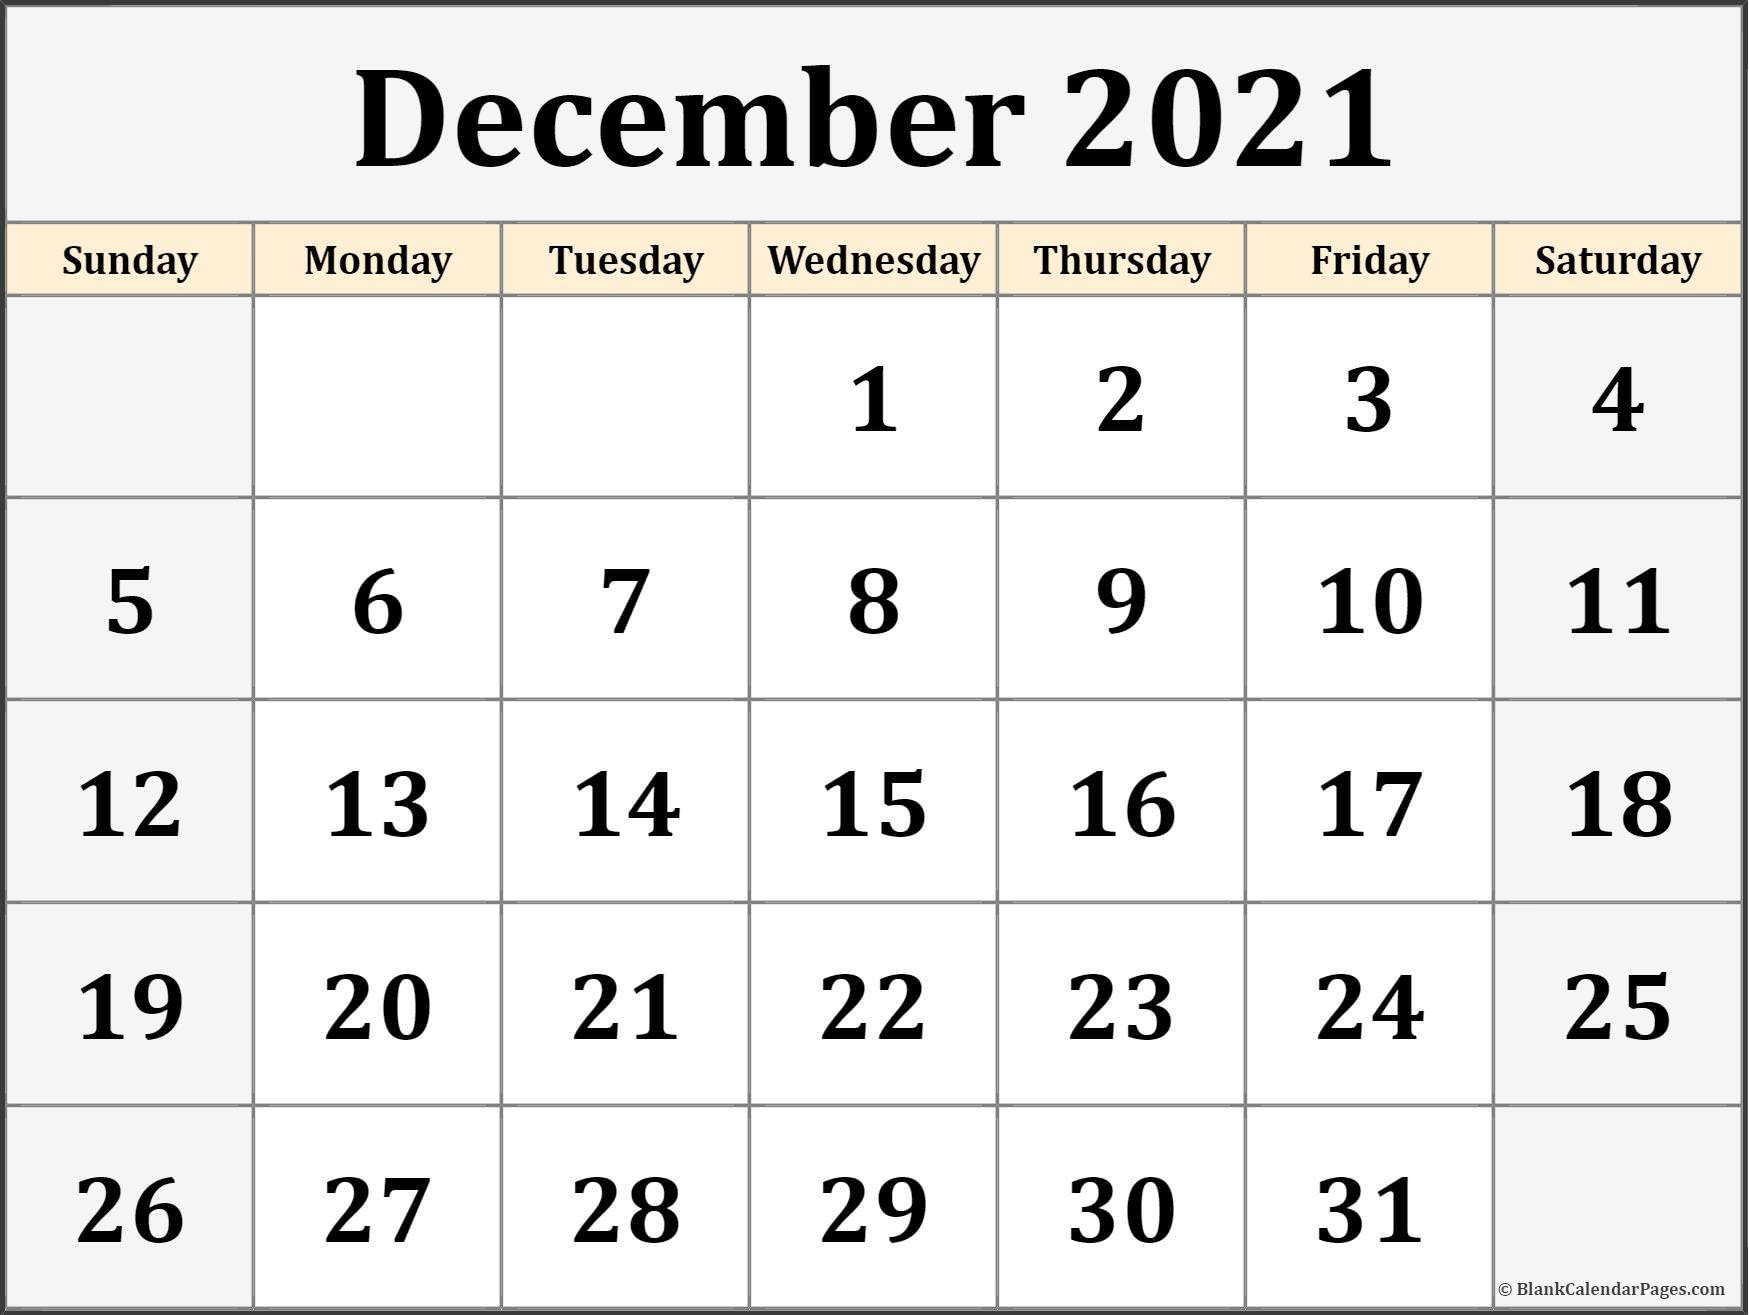 December 2021 Calendar Free Printable Monthly Calendars 1